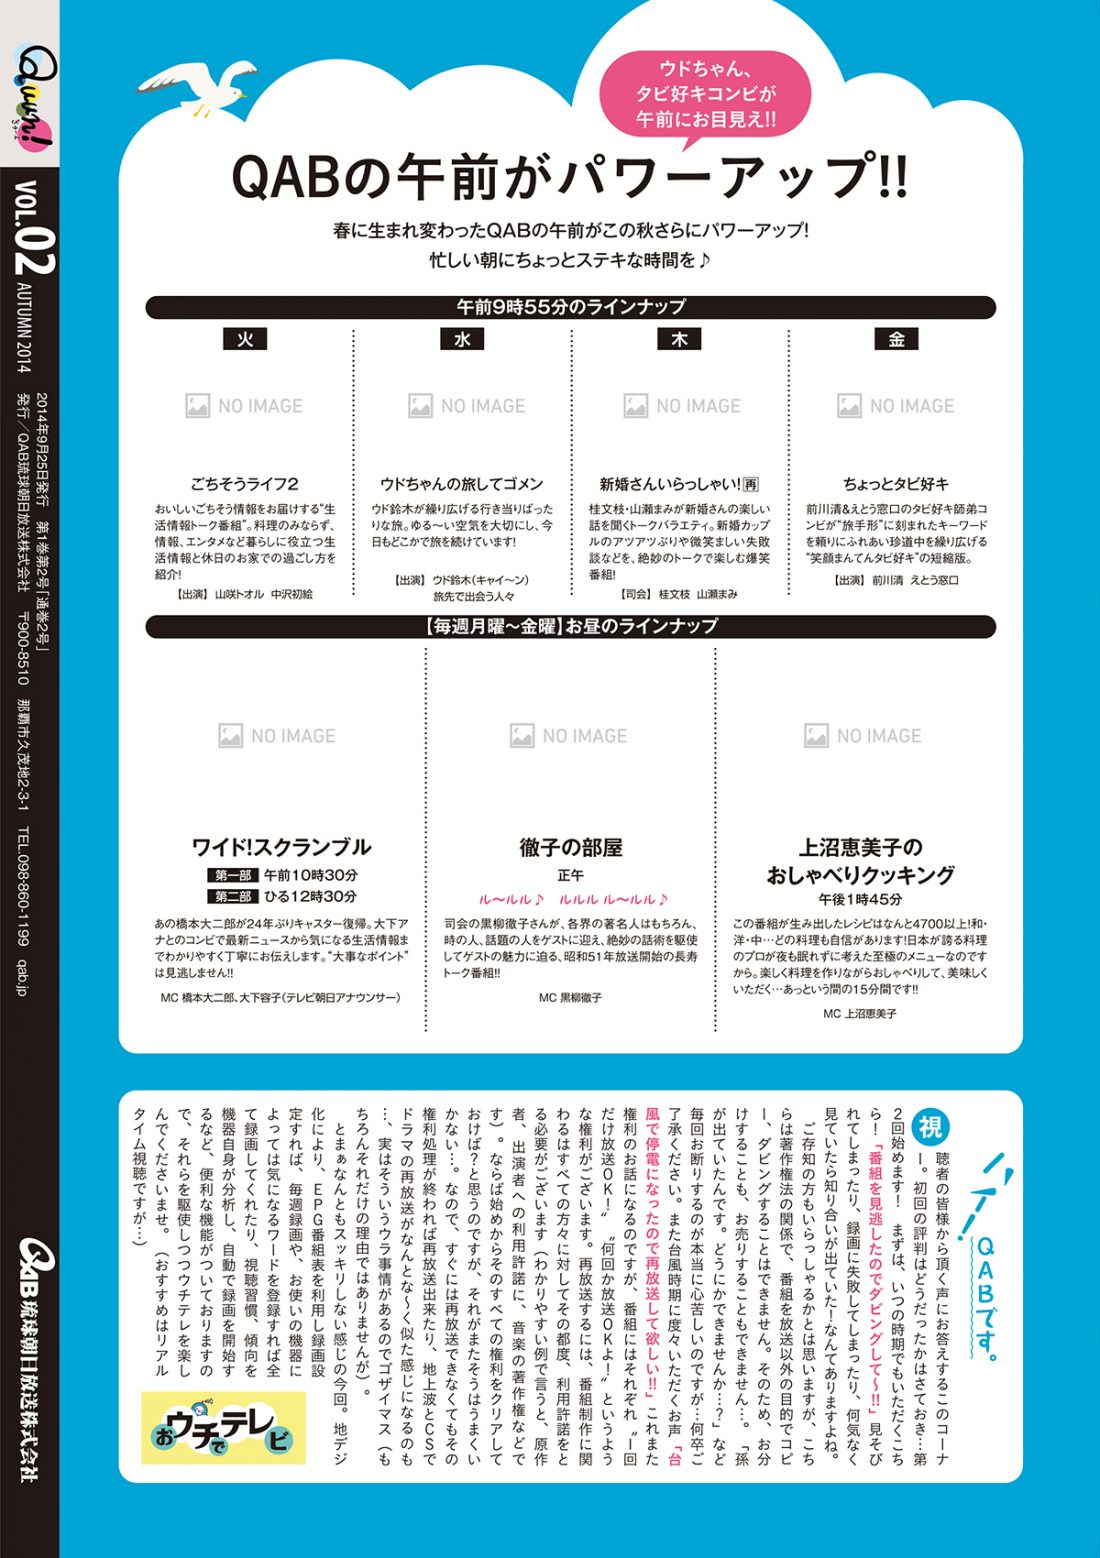 http://www.qab.co.jp/qgoro/wp-content/uploads/quun_0216-1100x1558.jpg